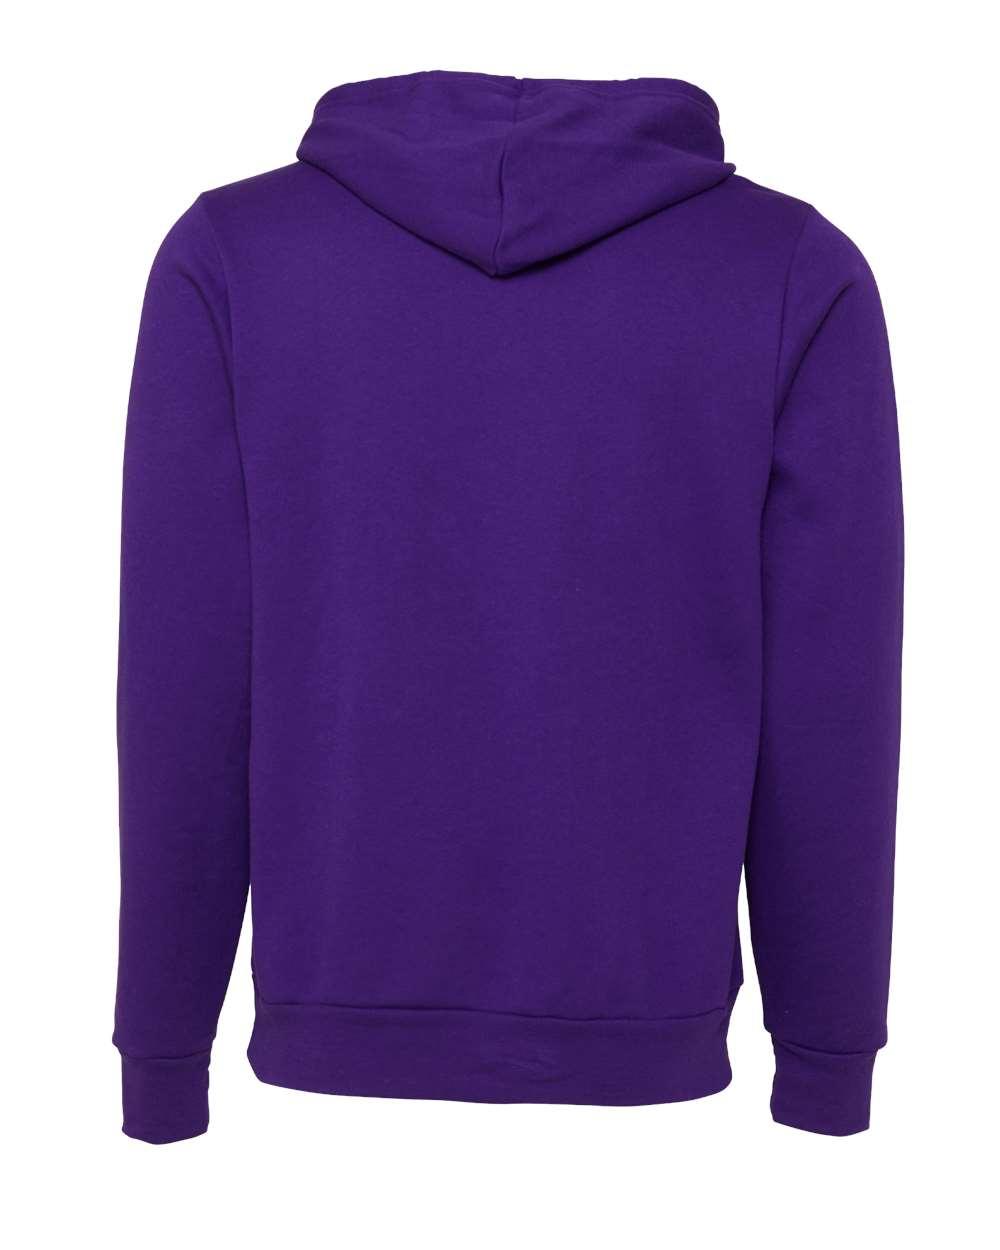 Bella-Canvas-Unisex-Sponge-Hooded-Pullover-Sweatshirt-Blank-3719-up-to-2XL thumbnail 96